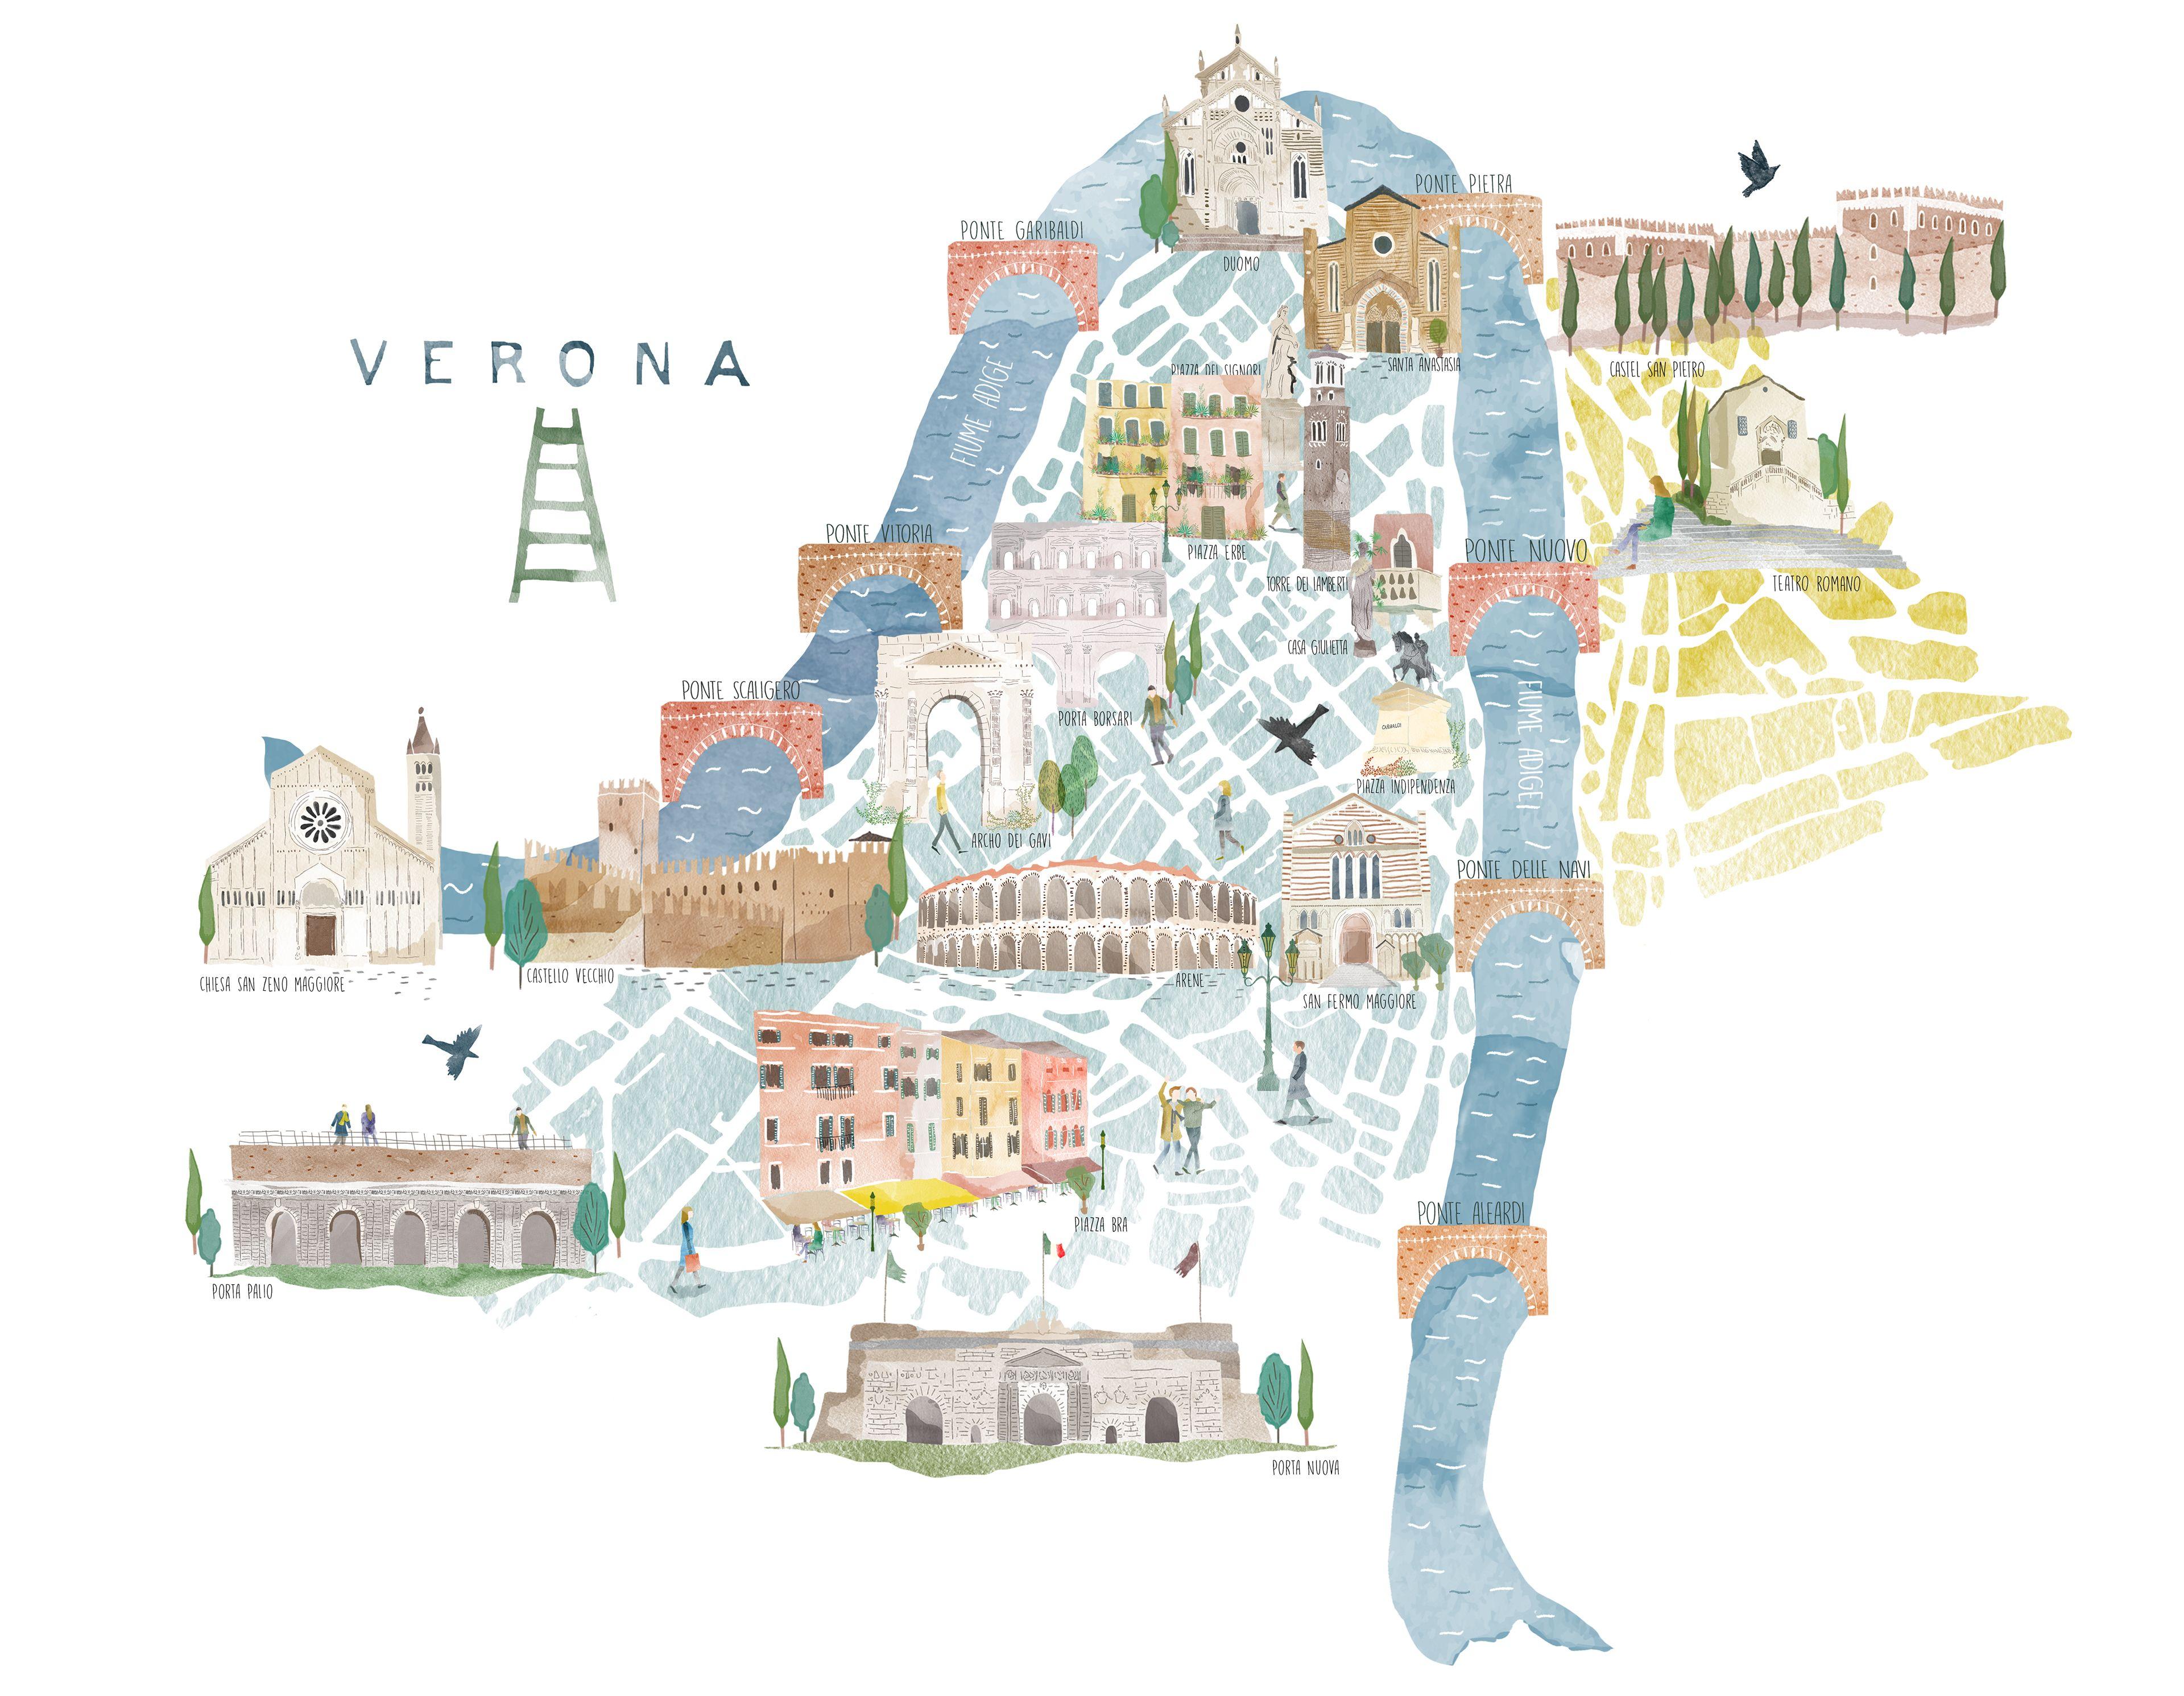 Map Of Verona Italy Europe 2017 In 2019 Italy Travel